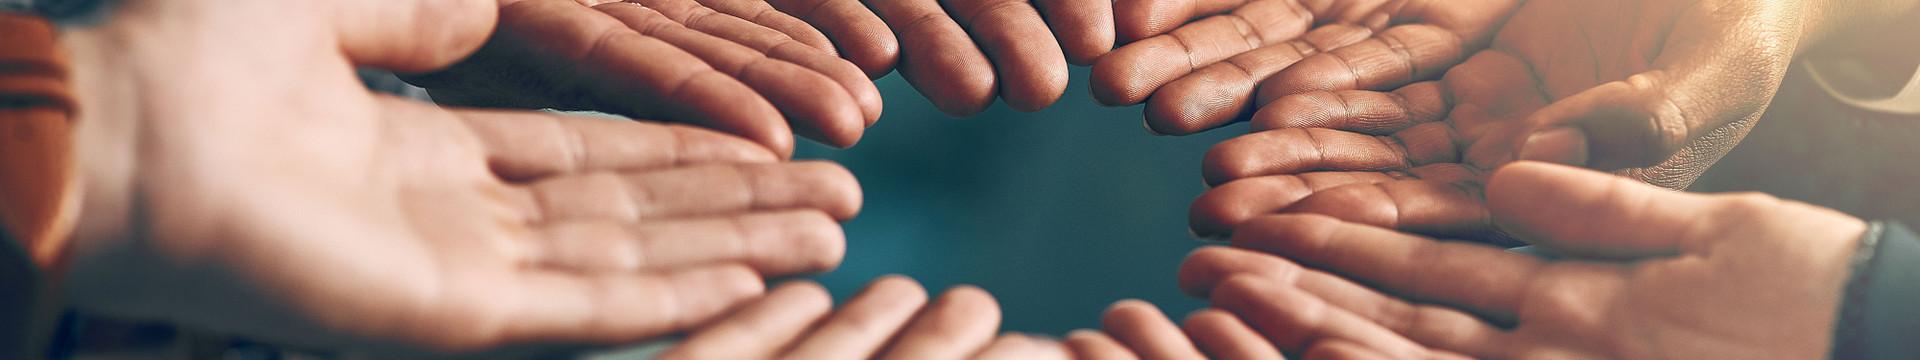 A Smoky Mountain Retreat - Hands